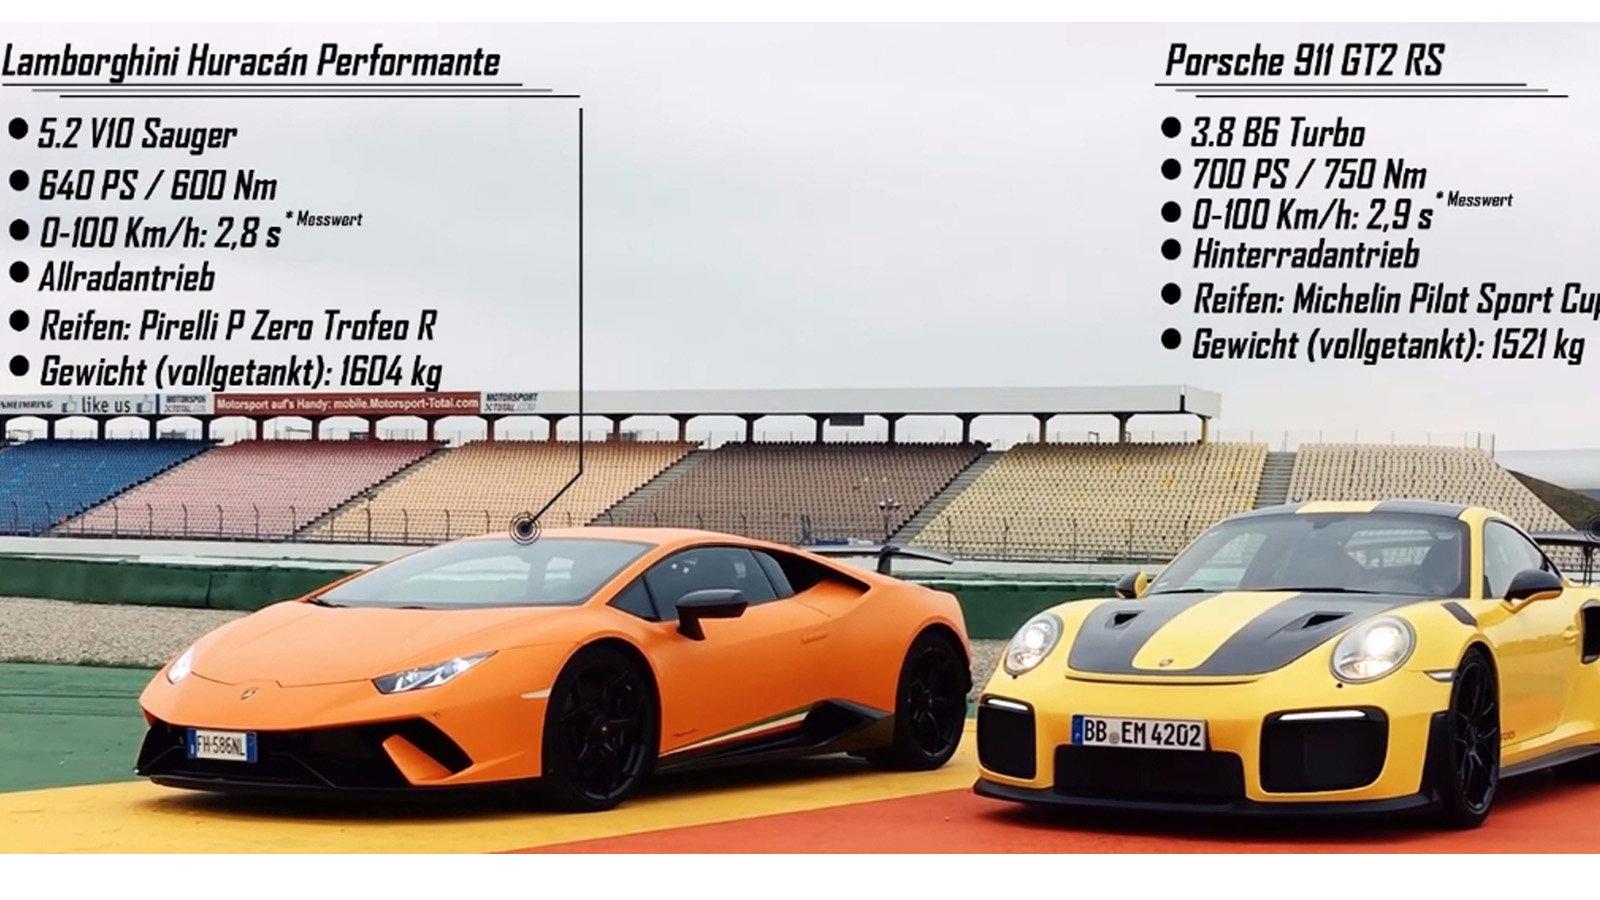 Gt2 Rs Mr Slaughters Lamborghini Record At Nurburgring Rennlist